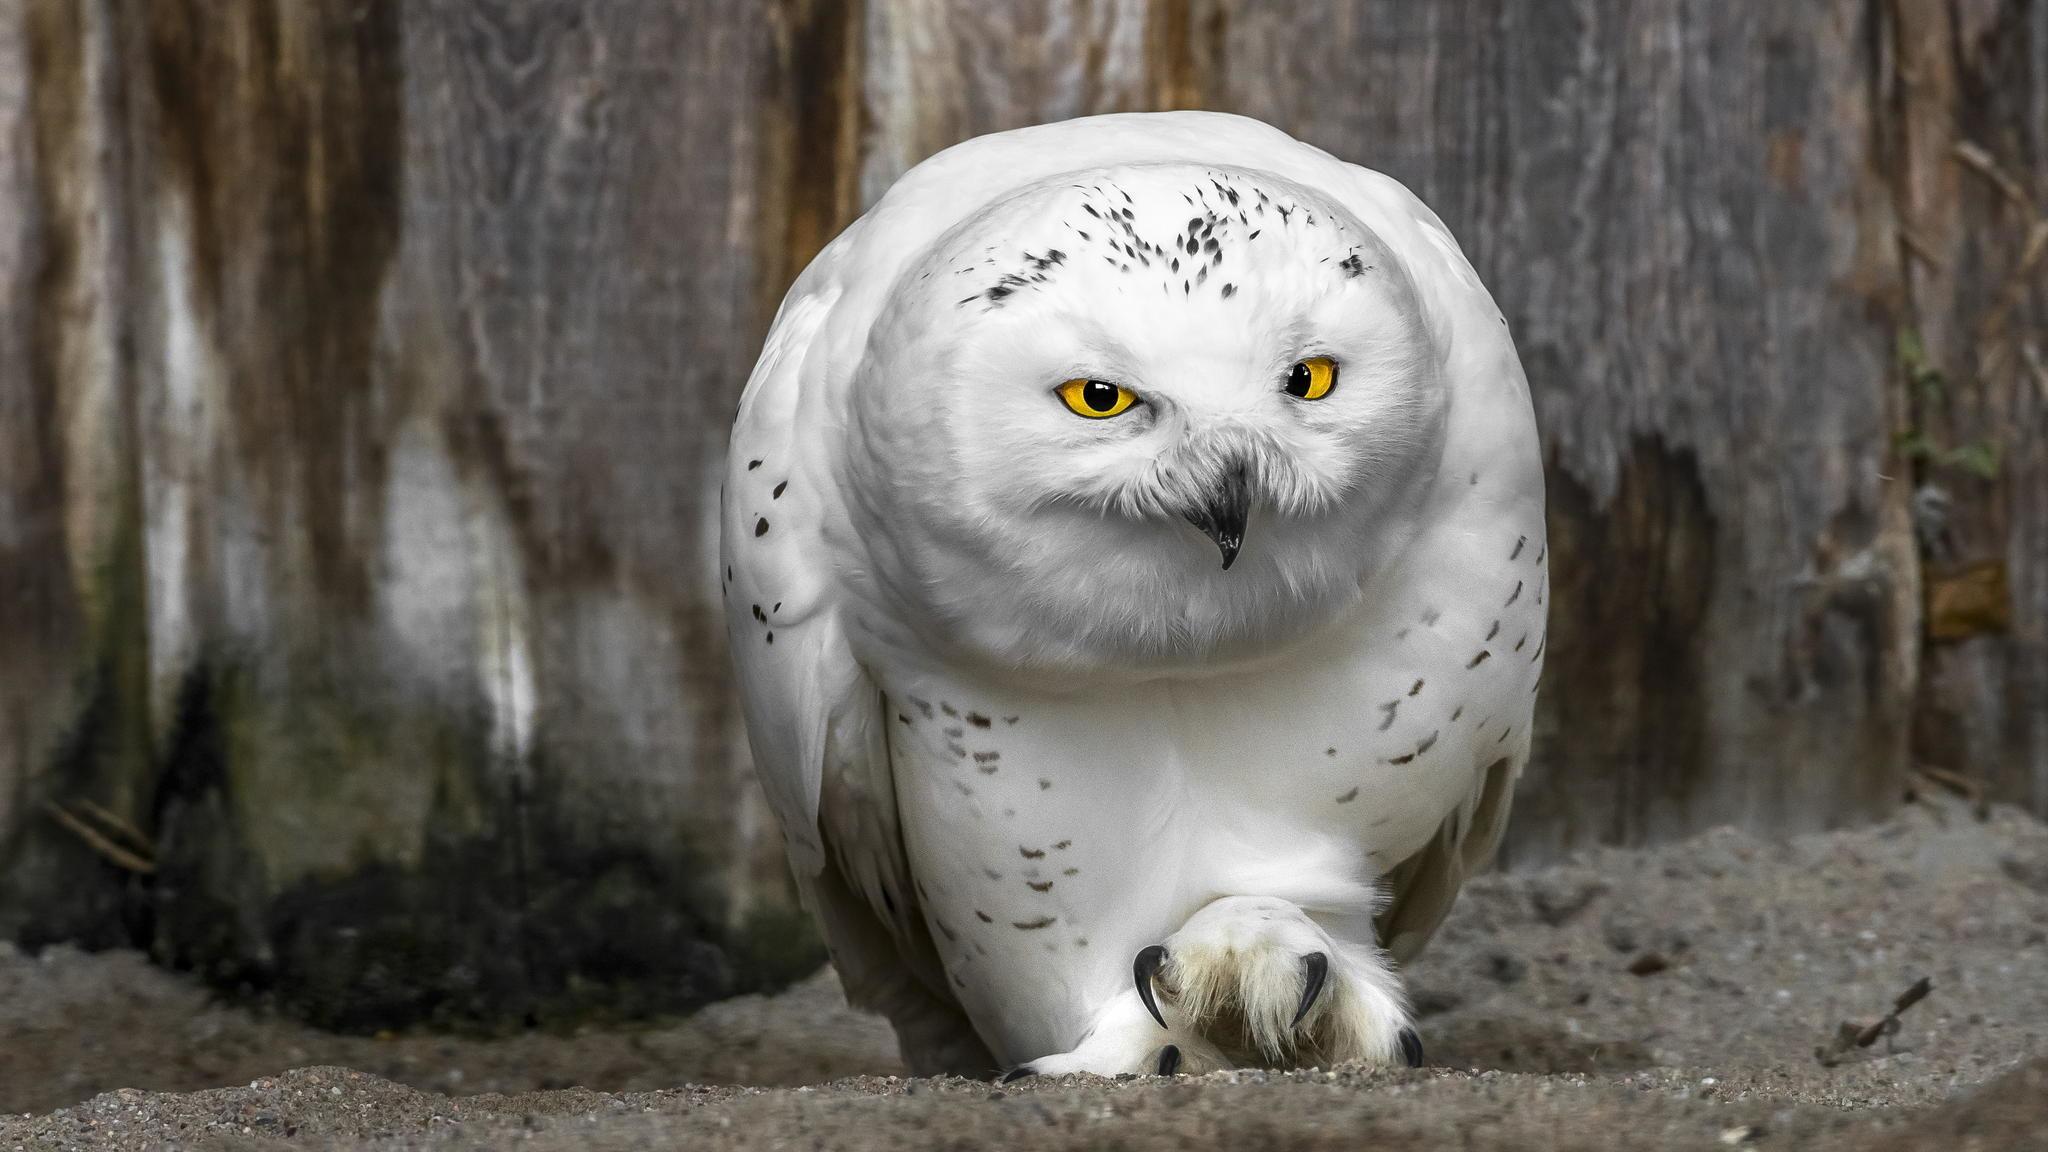 Beautiful White Owl HD Wallpaper WallpaperFX 1600×1000 White Owl Wallpapers  (42 Wallpapers)